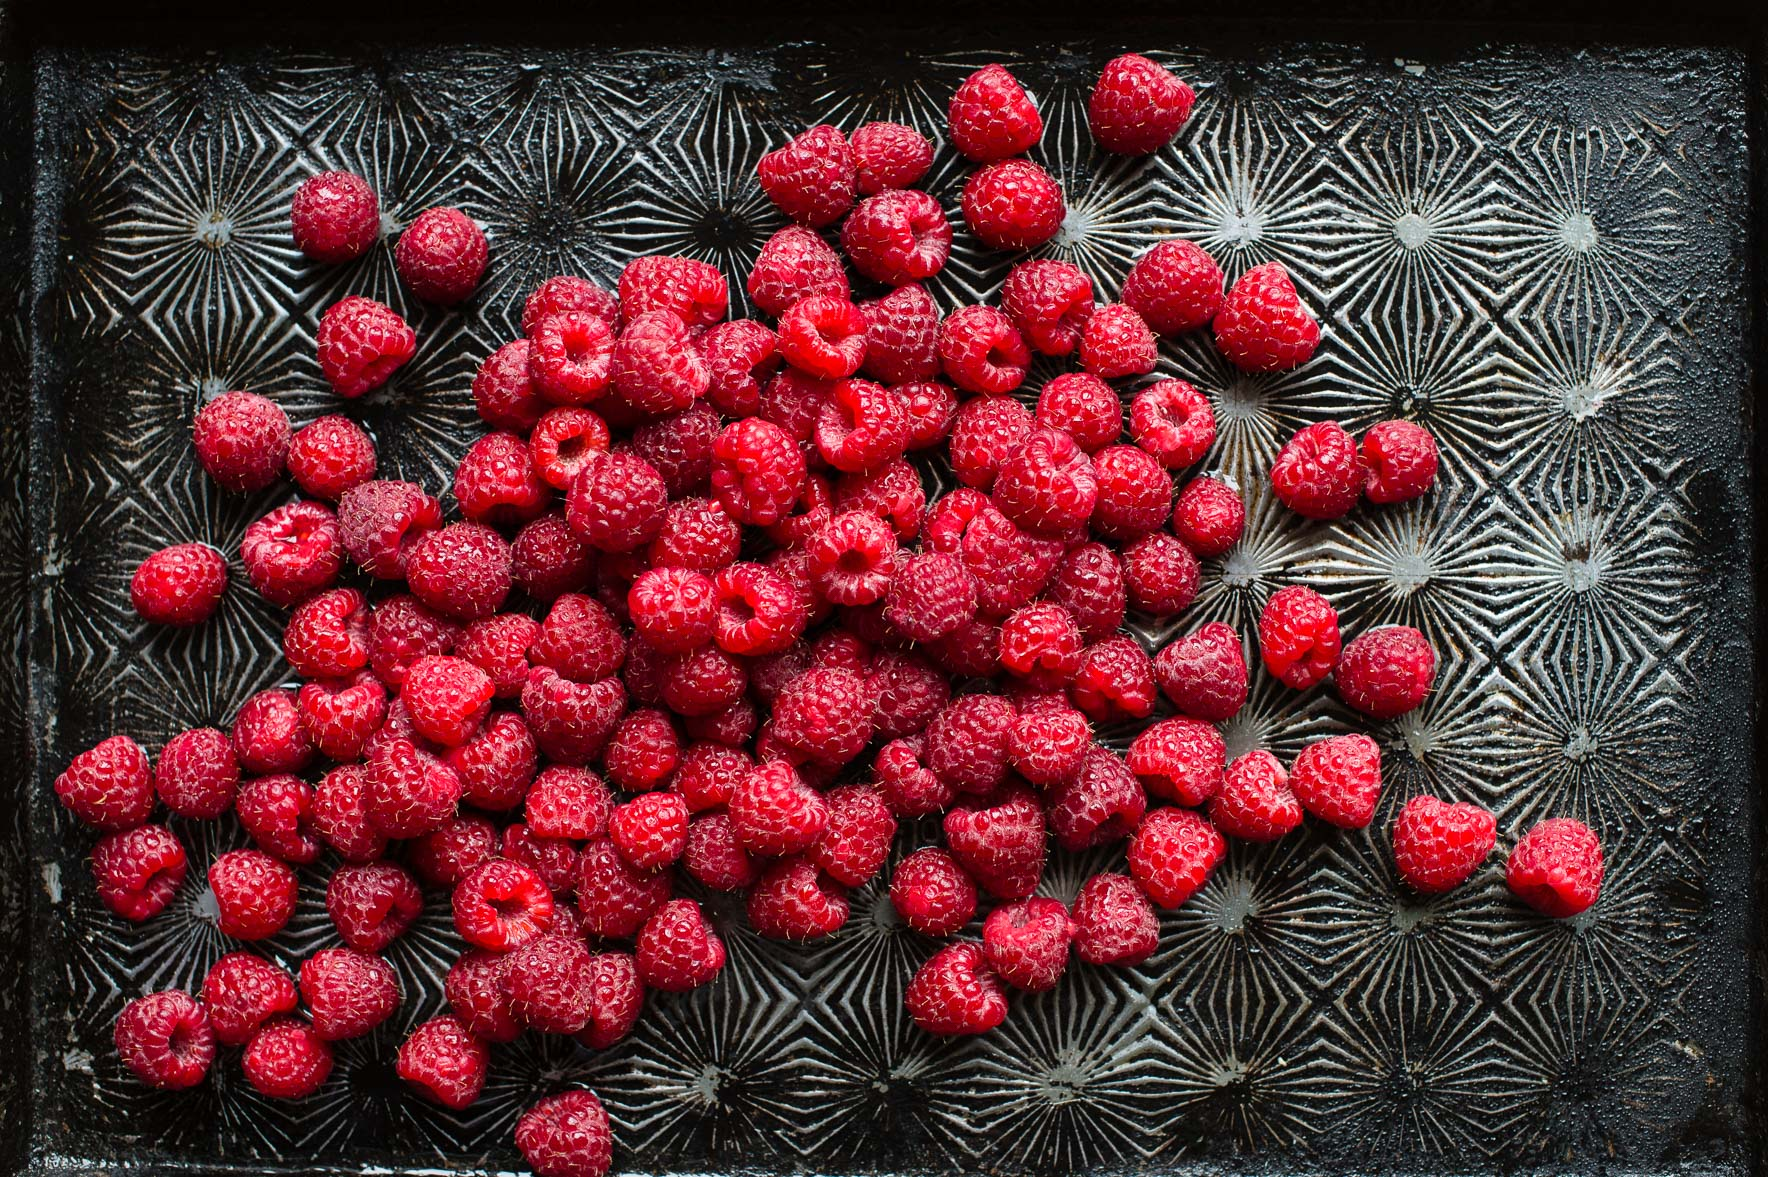 FreshRaspberries-020.jpg